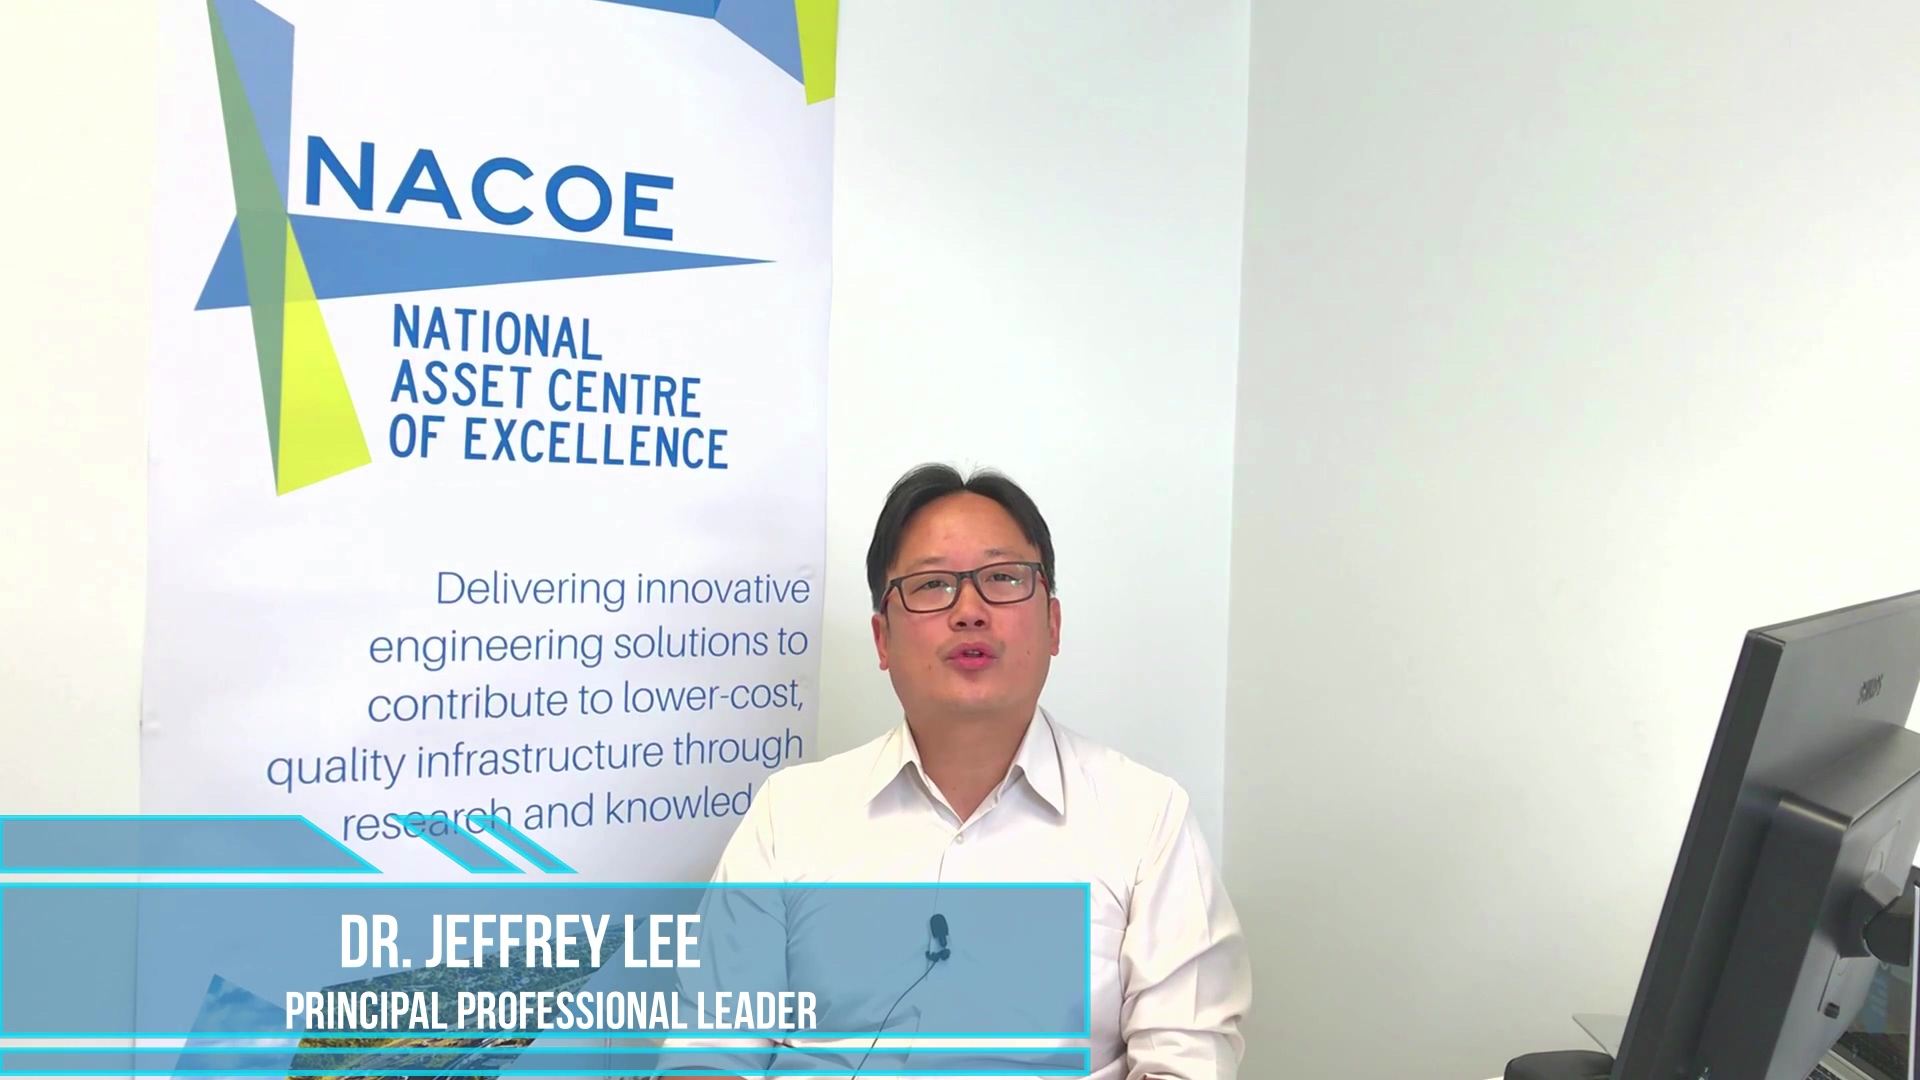 NACOE Intelligent Compaction Jeffrey Lee Infrastructure Magazine